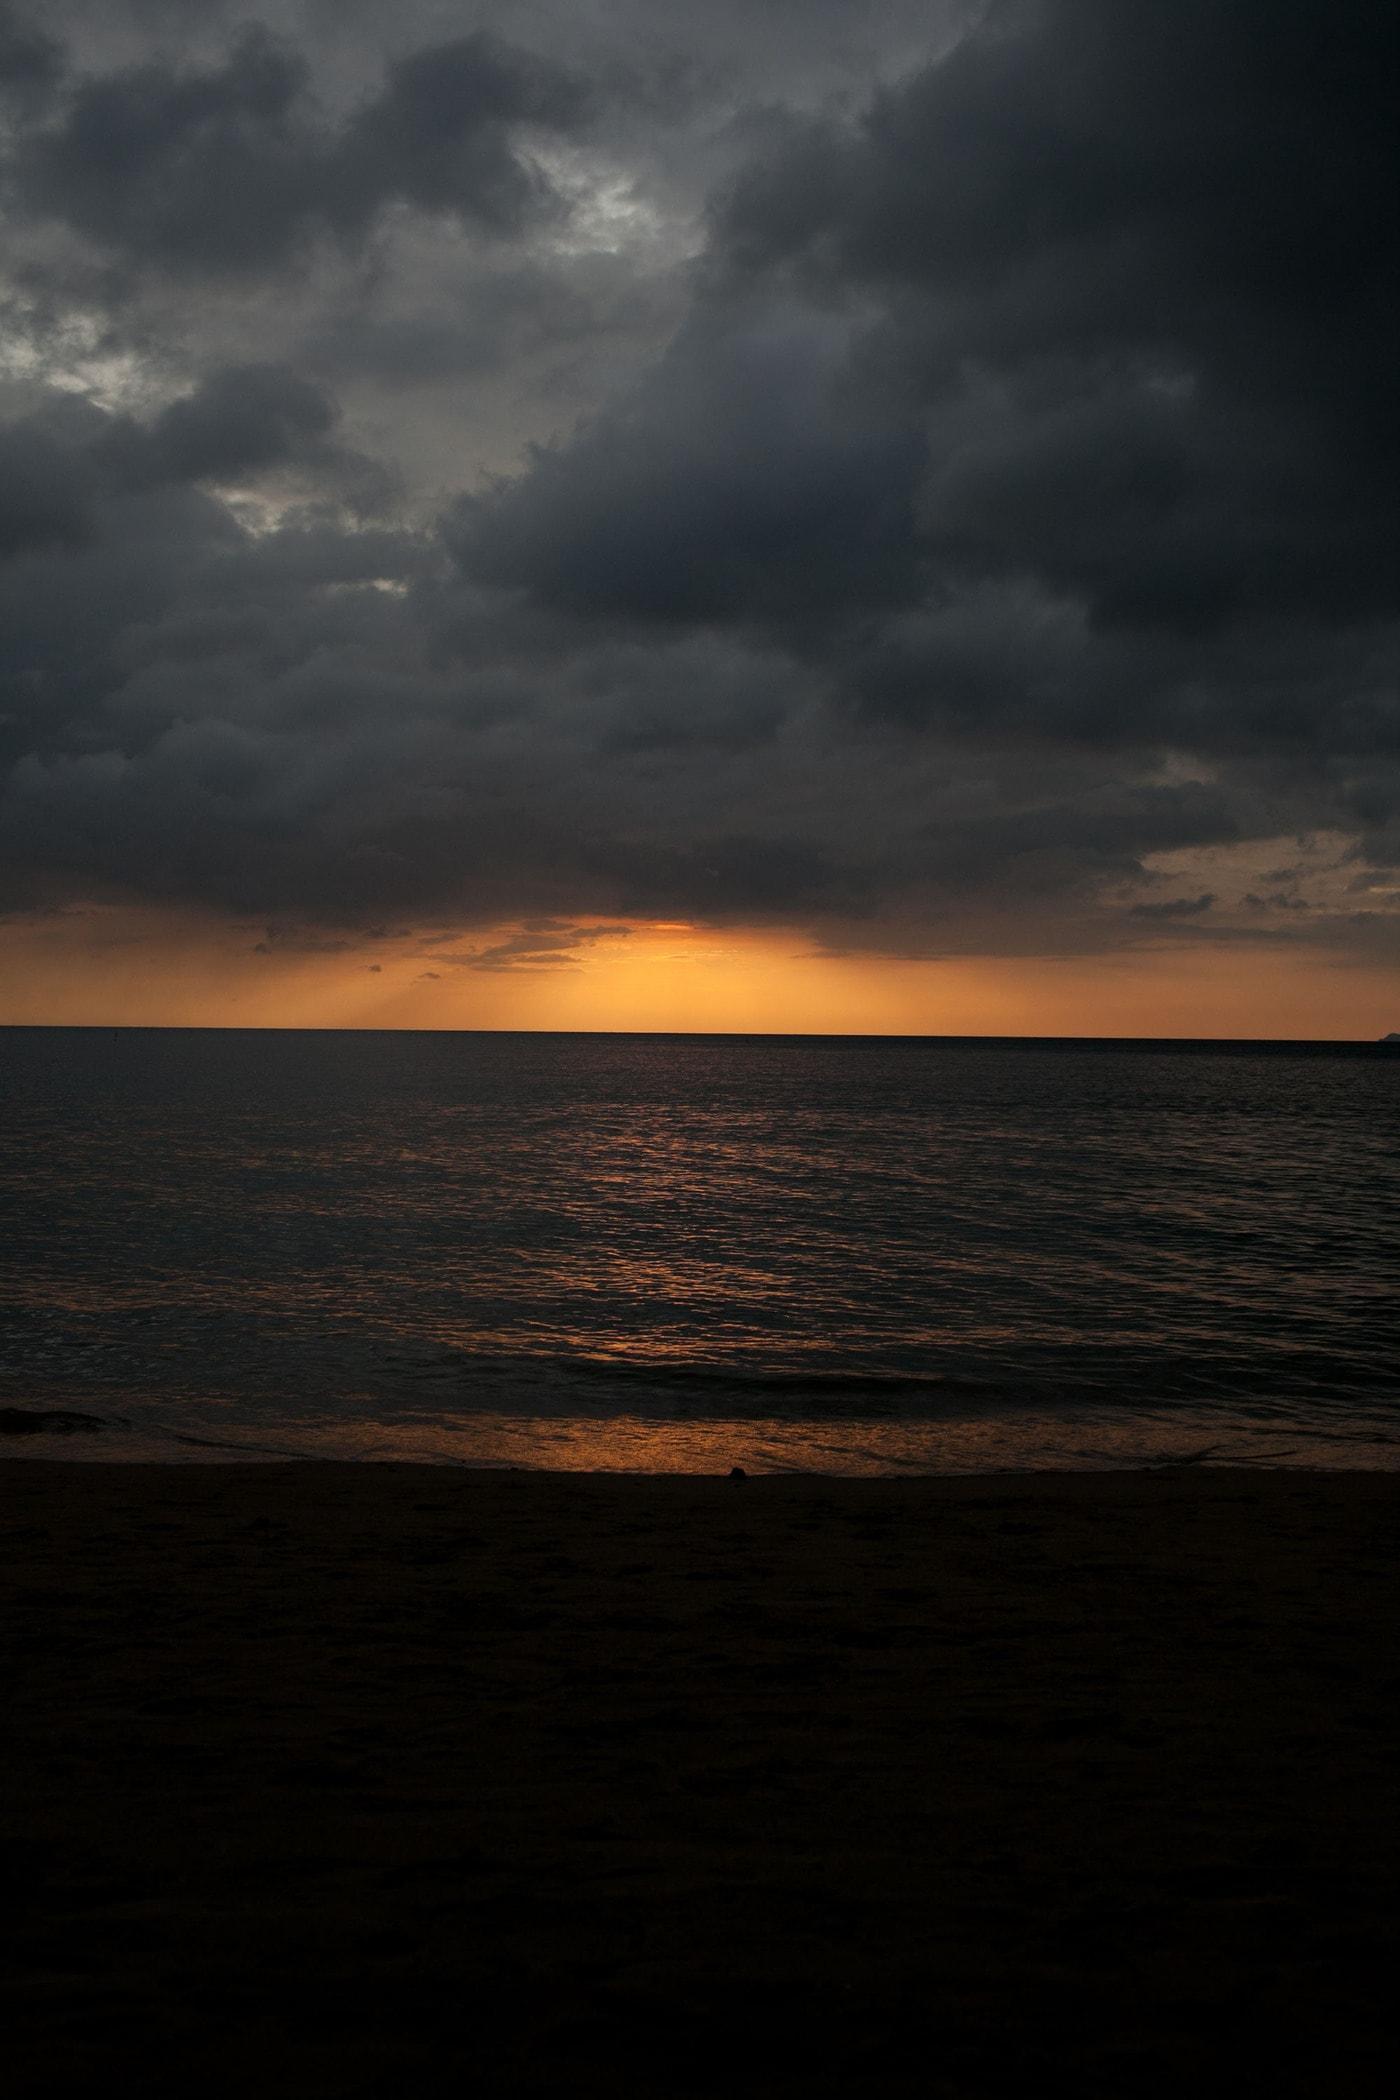 Sunset in Koh Lanta, Thailand